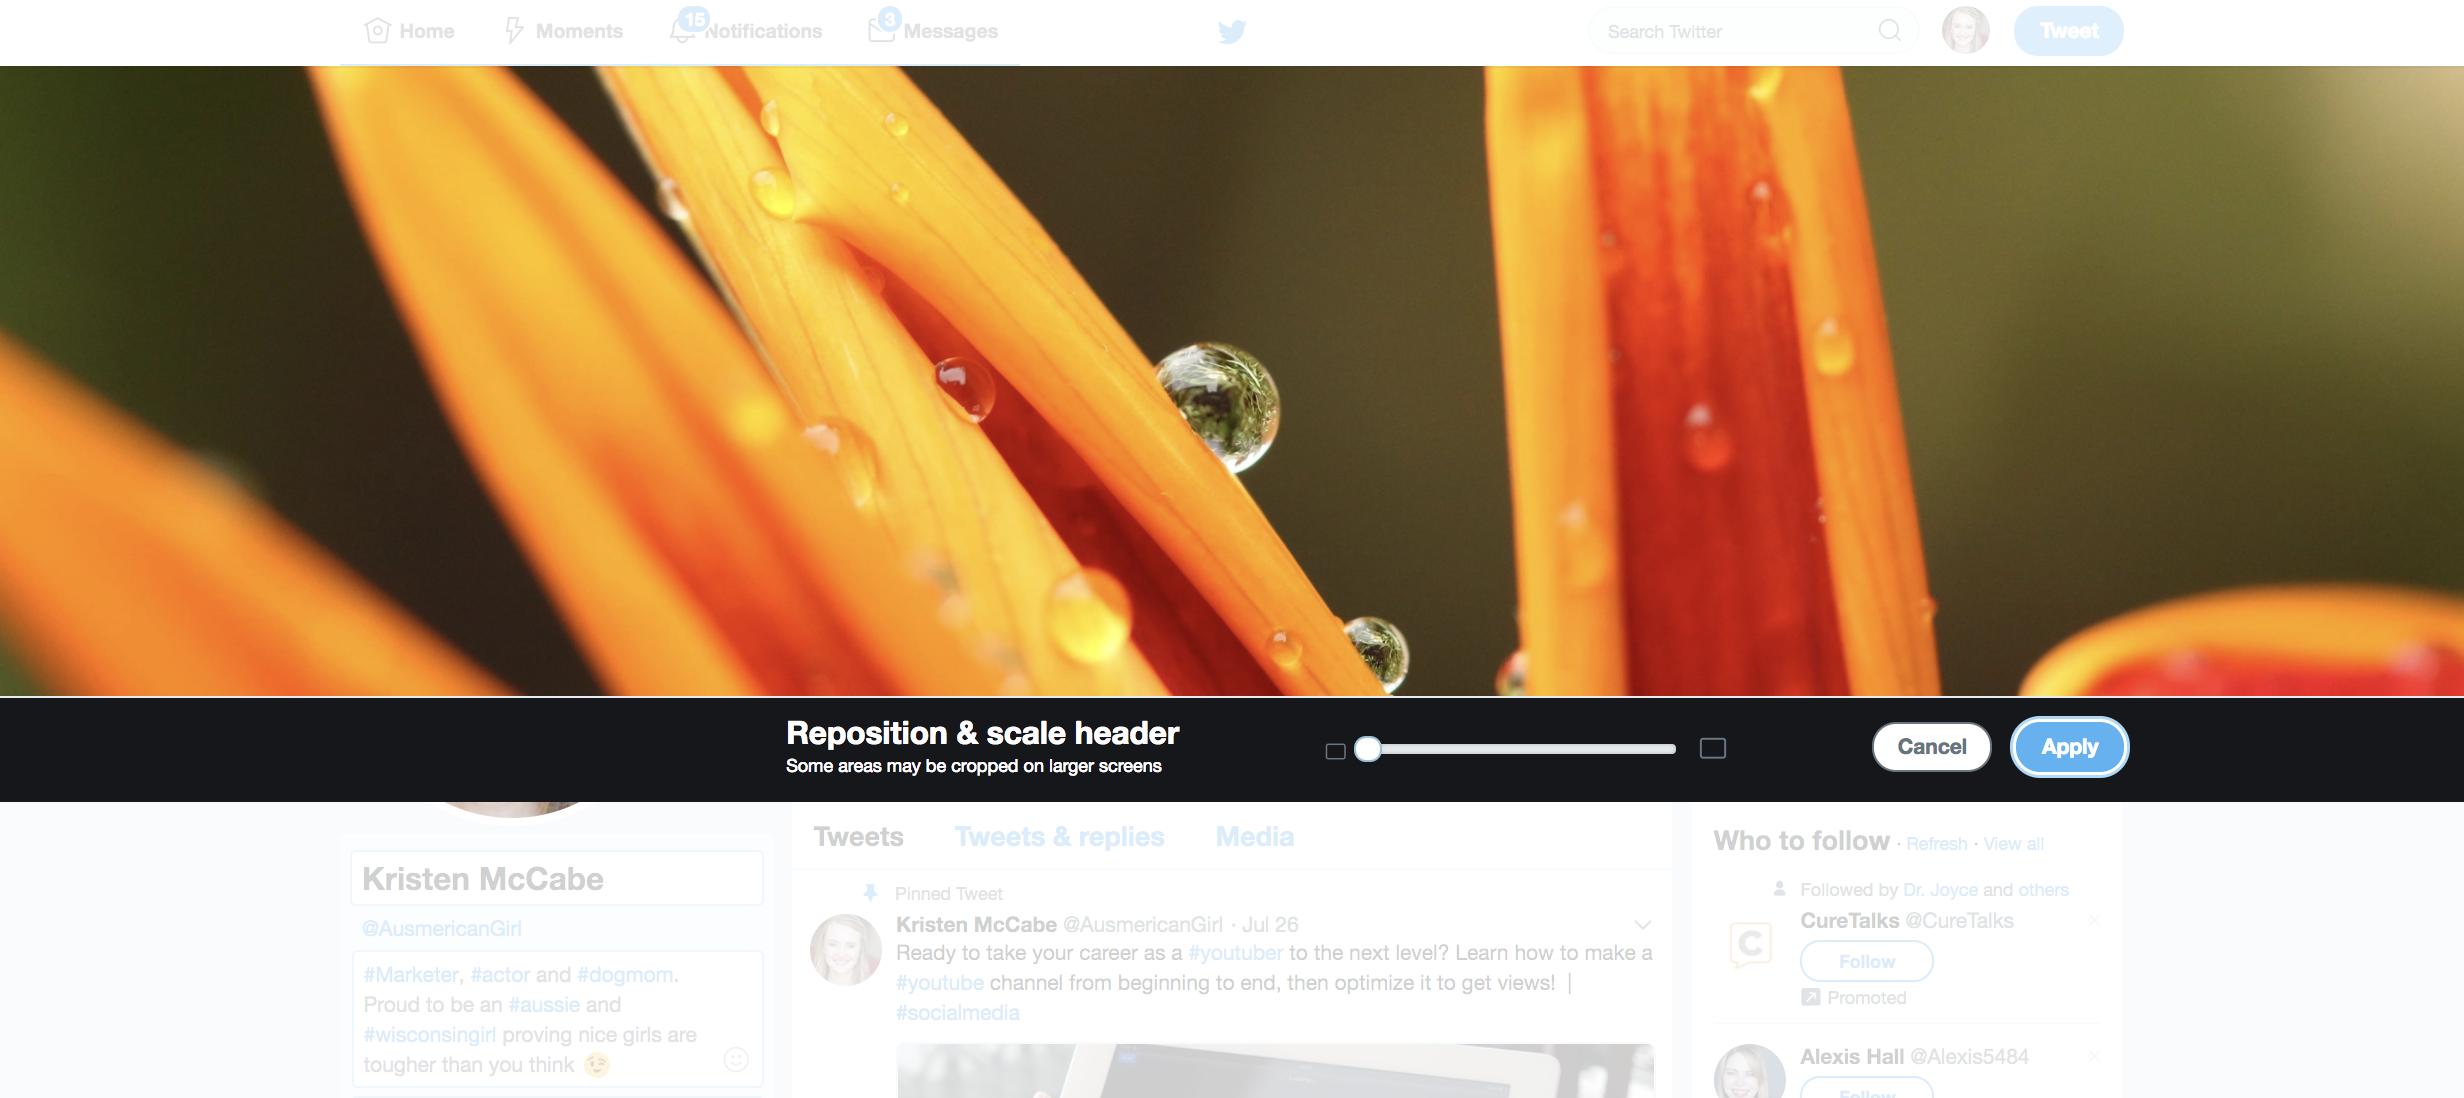 scale-Twitter-header-size